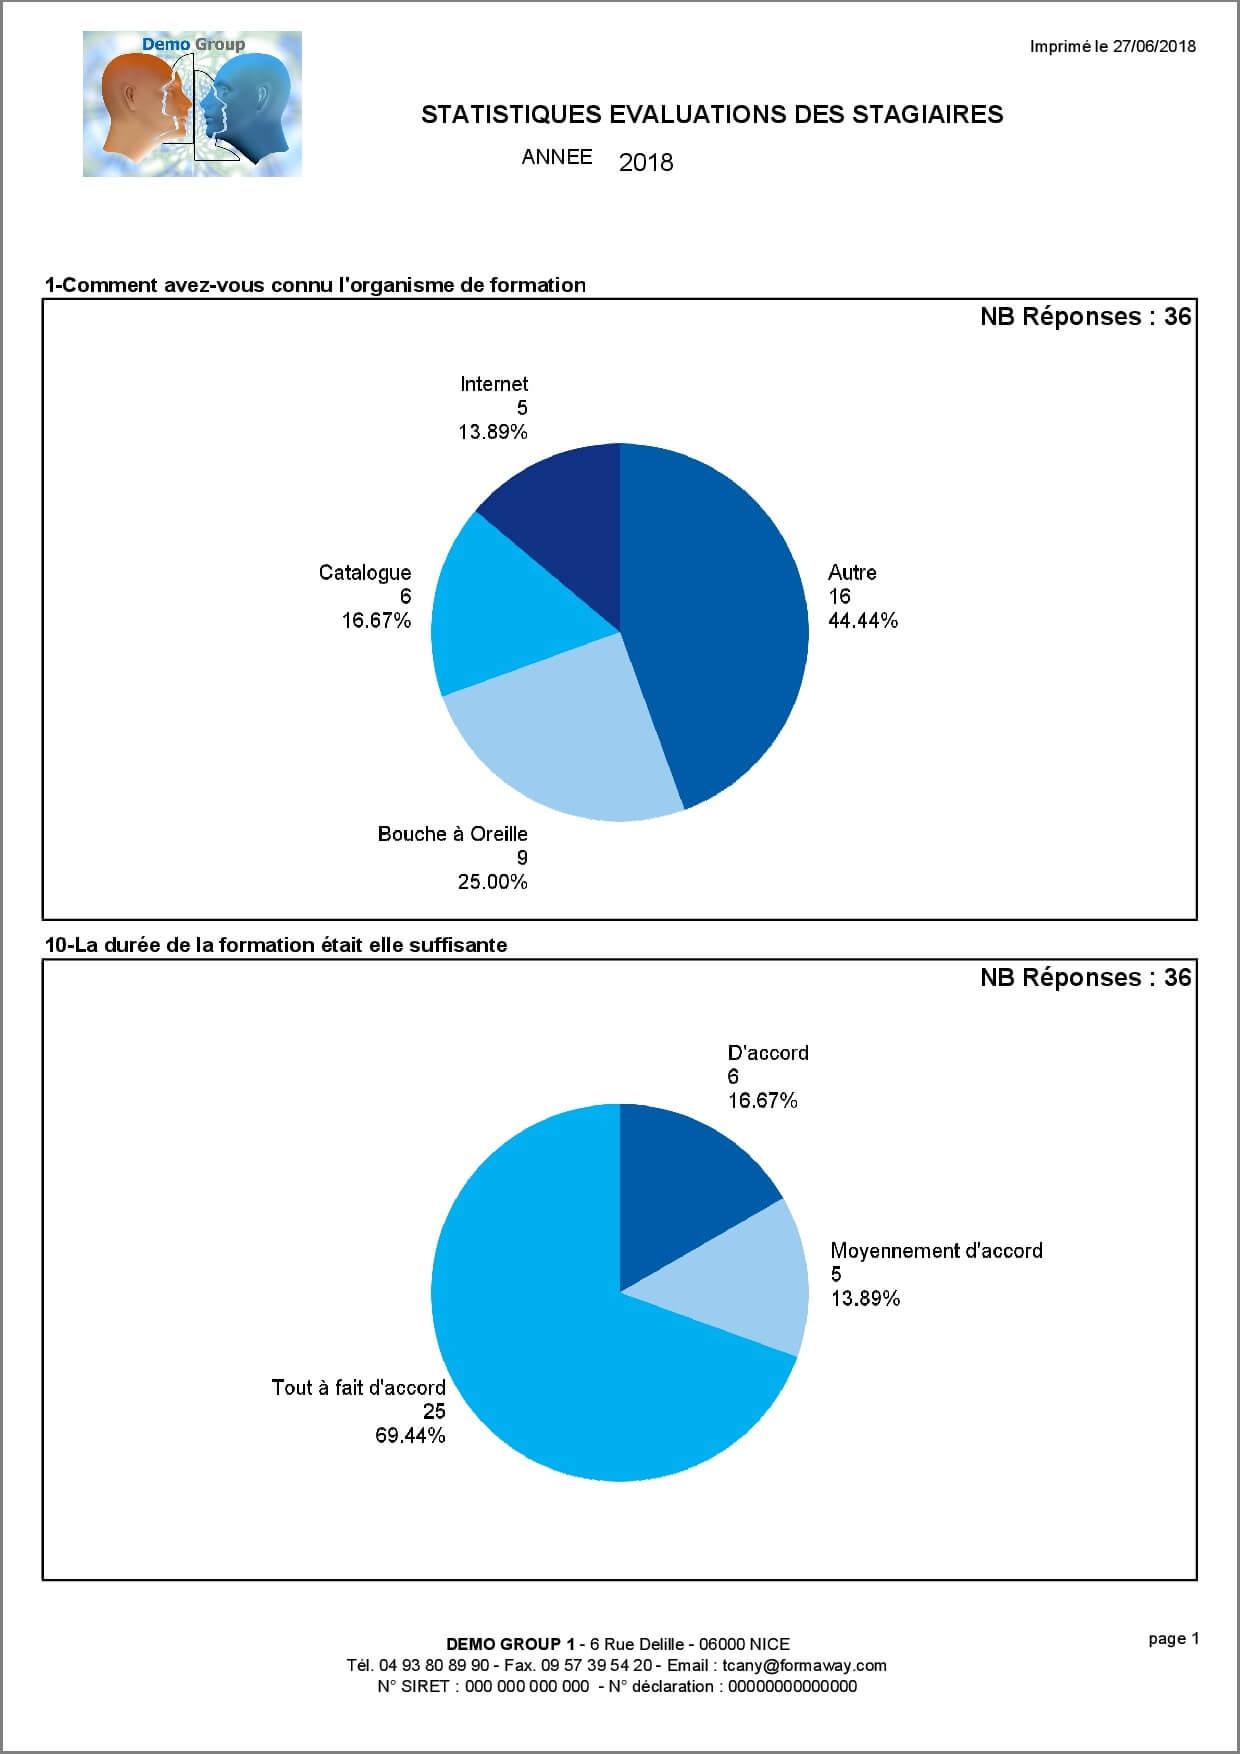 Stagiaire Modele Statistique Evaluation